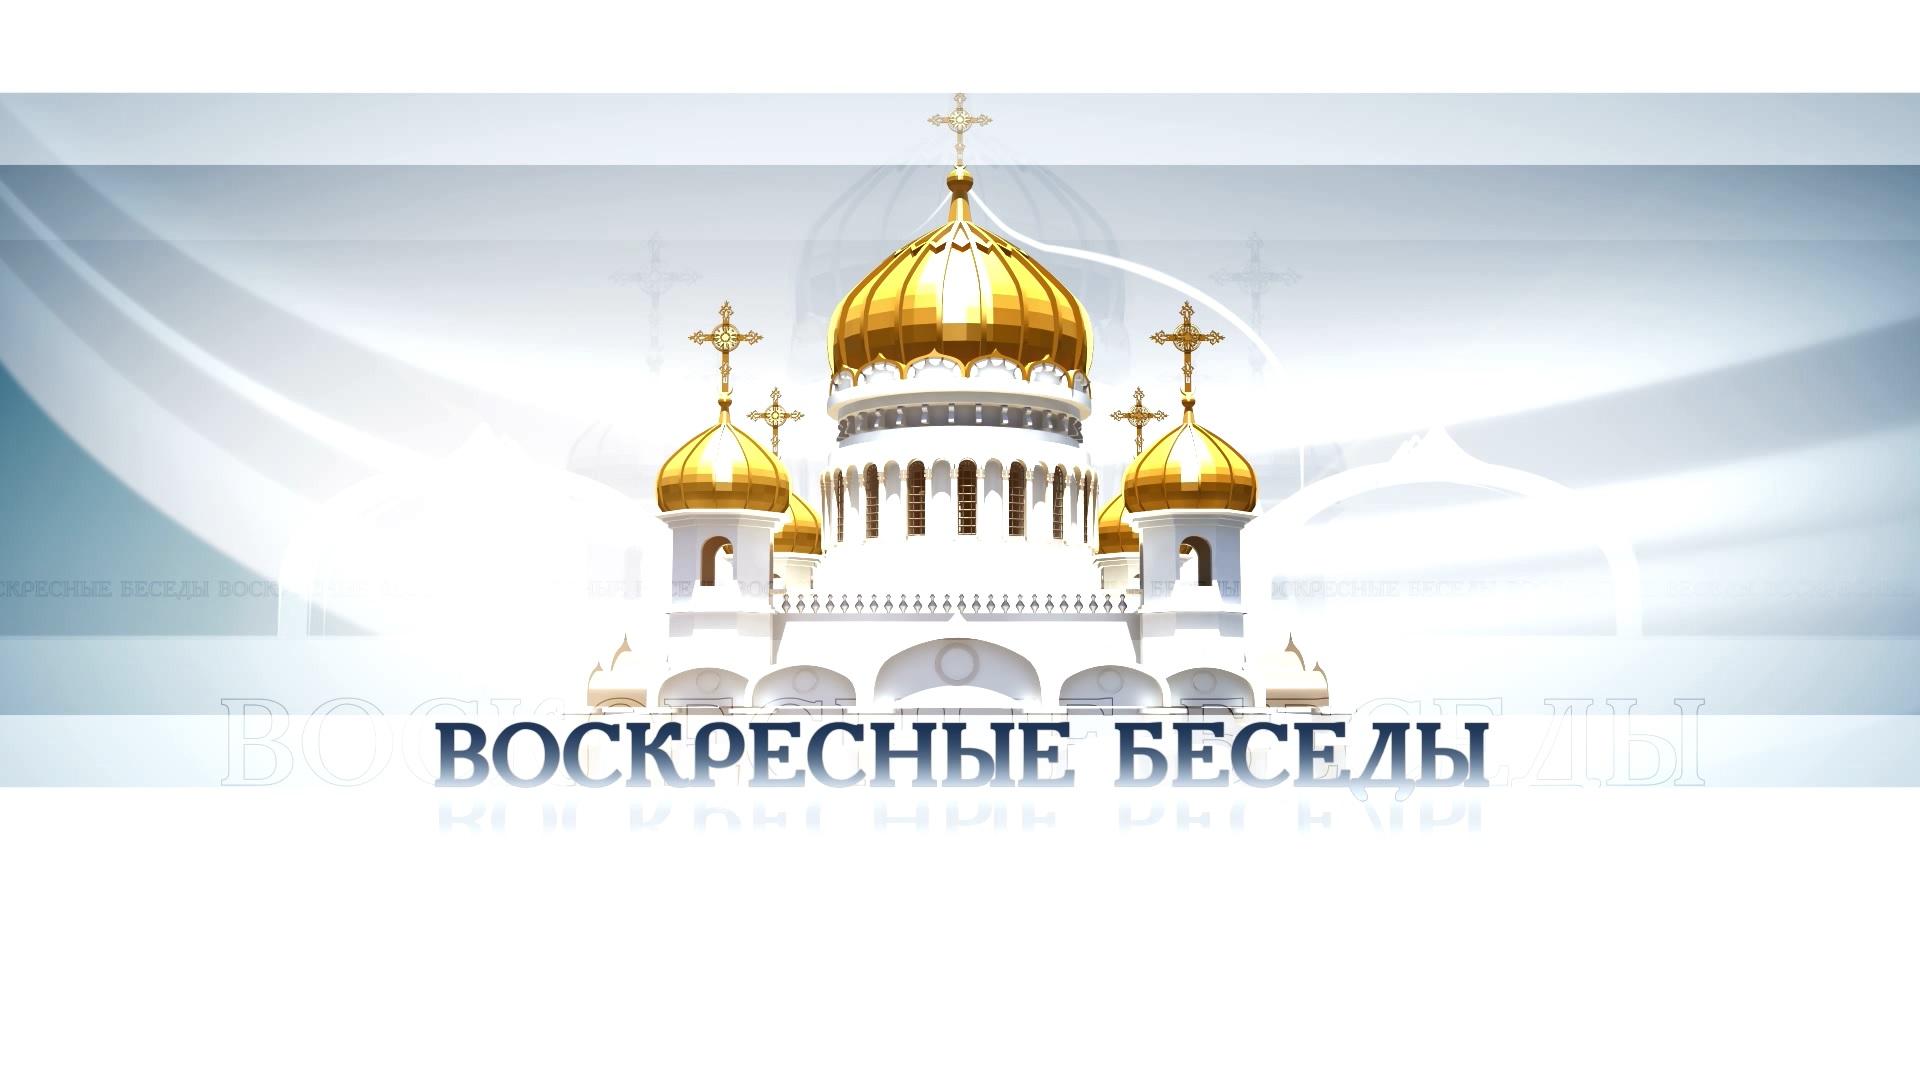 VB_14.05.17